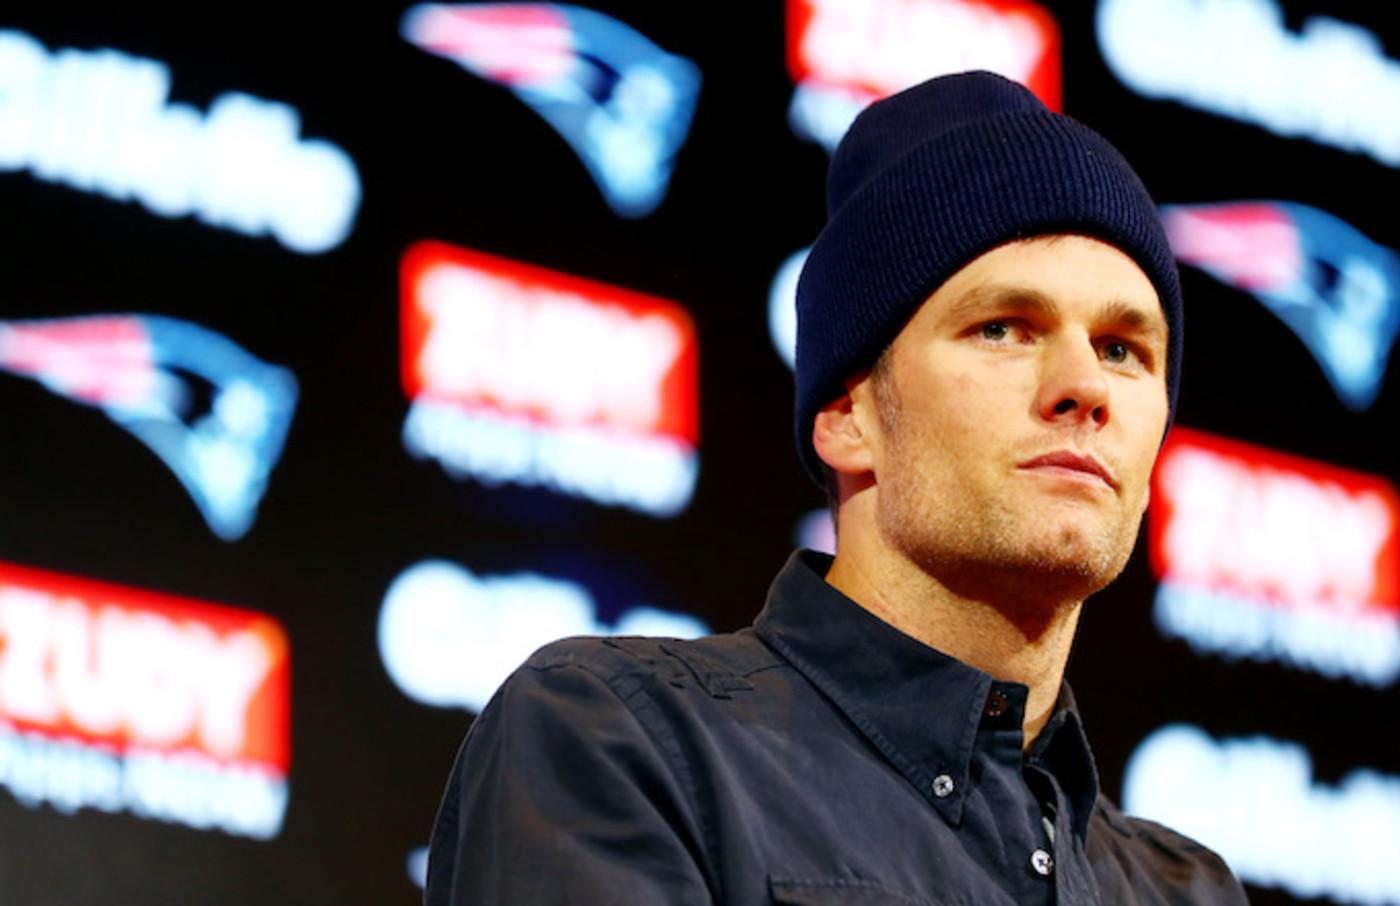 Tom Brady #12 of the New England Patriots speaks with the media.